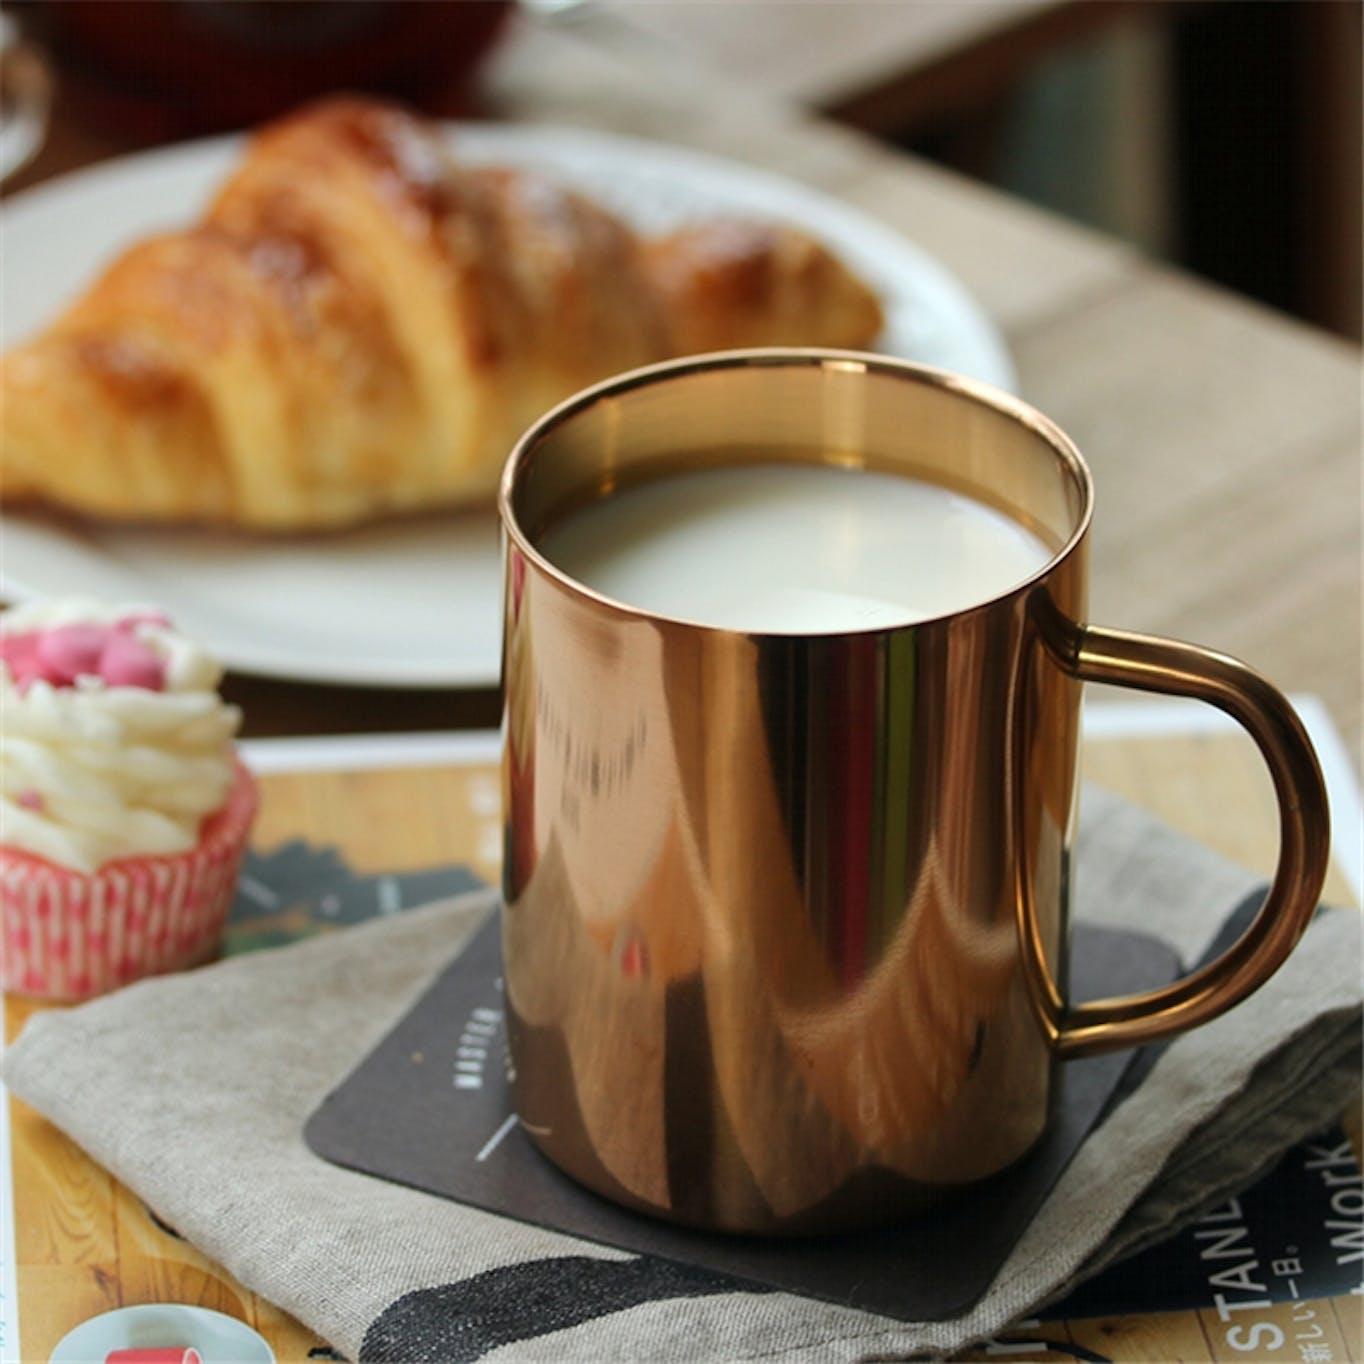 Copper drinking mug